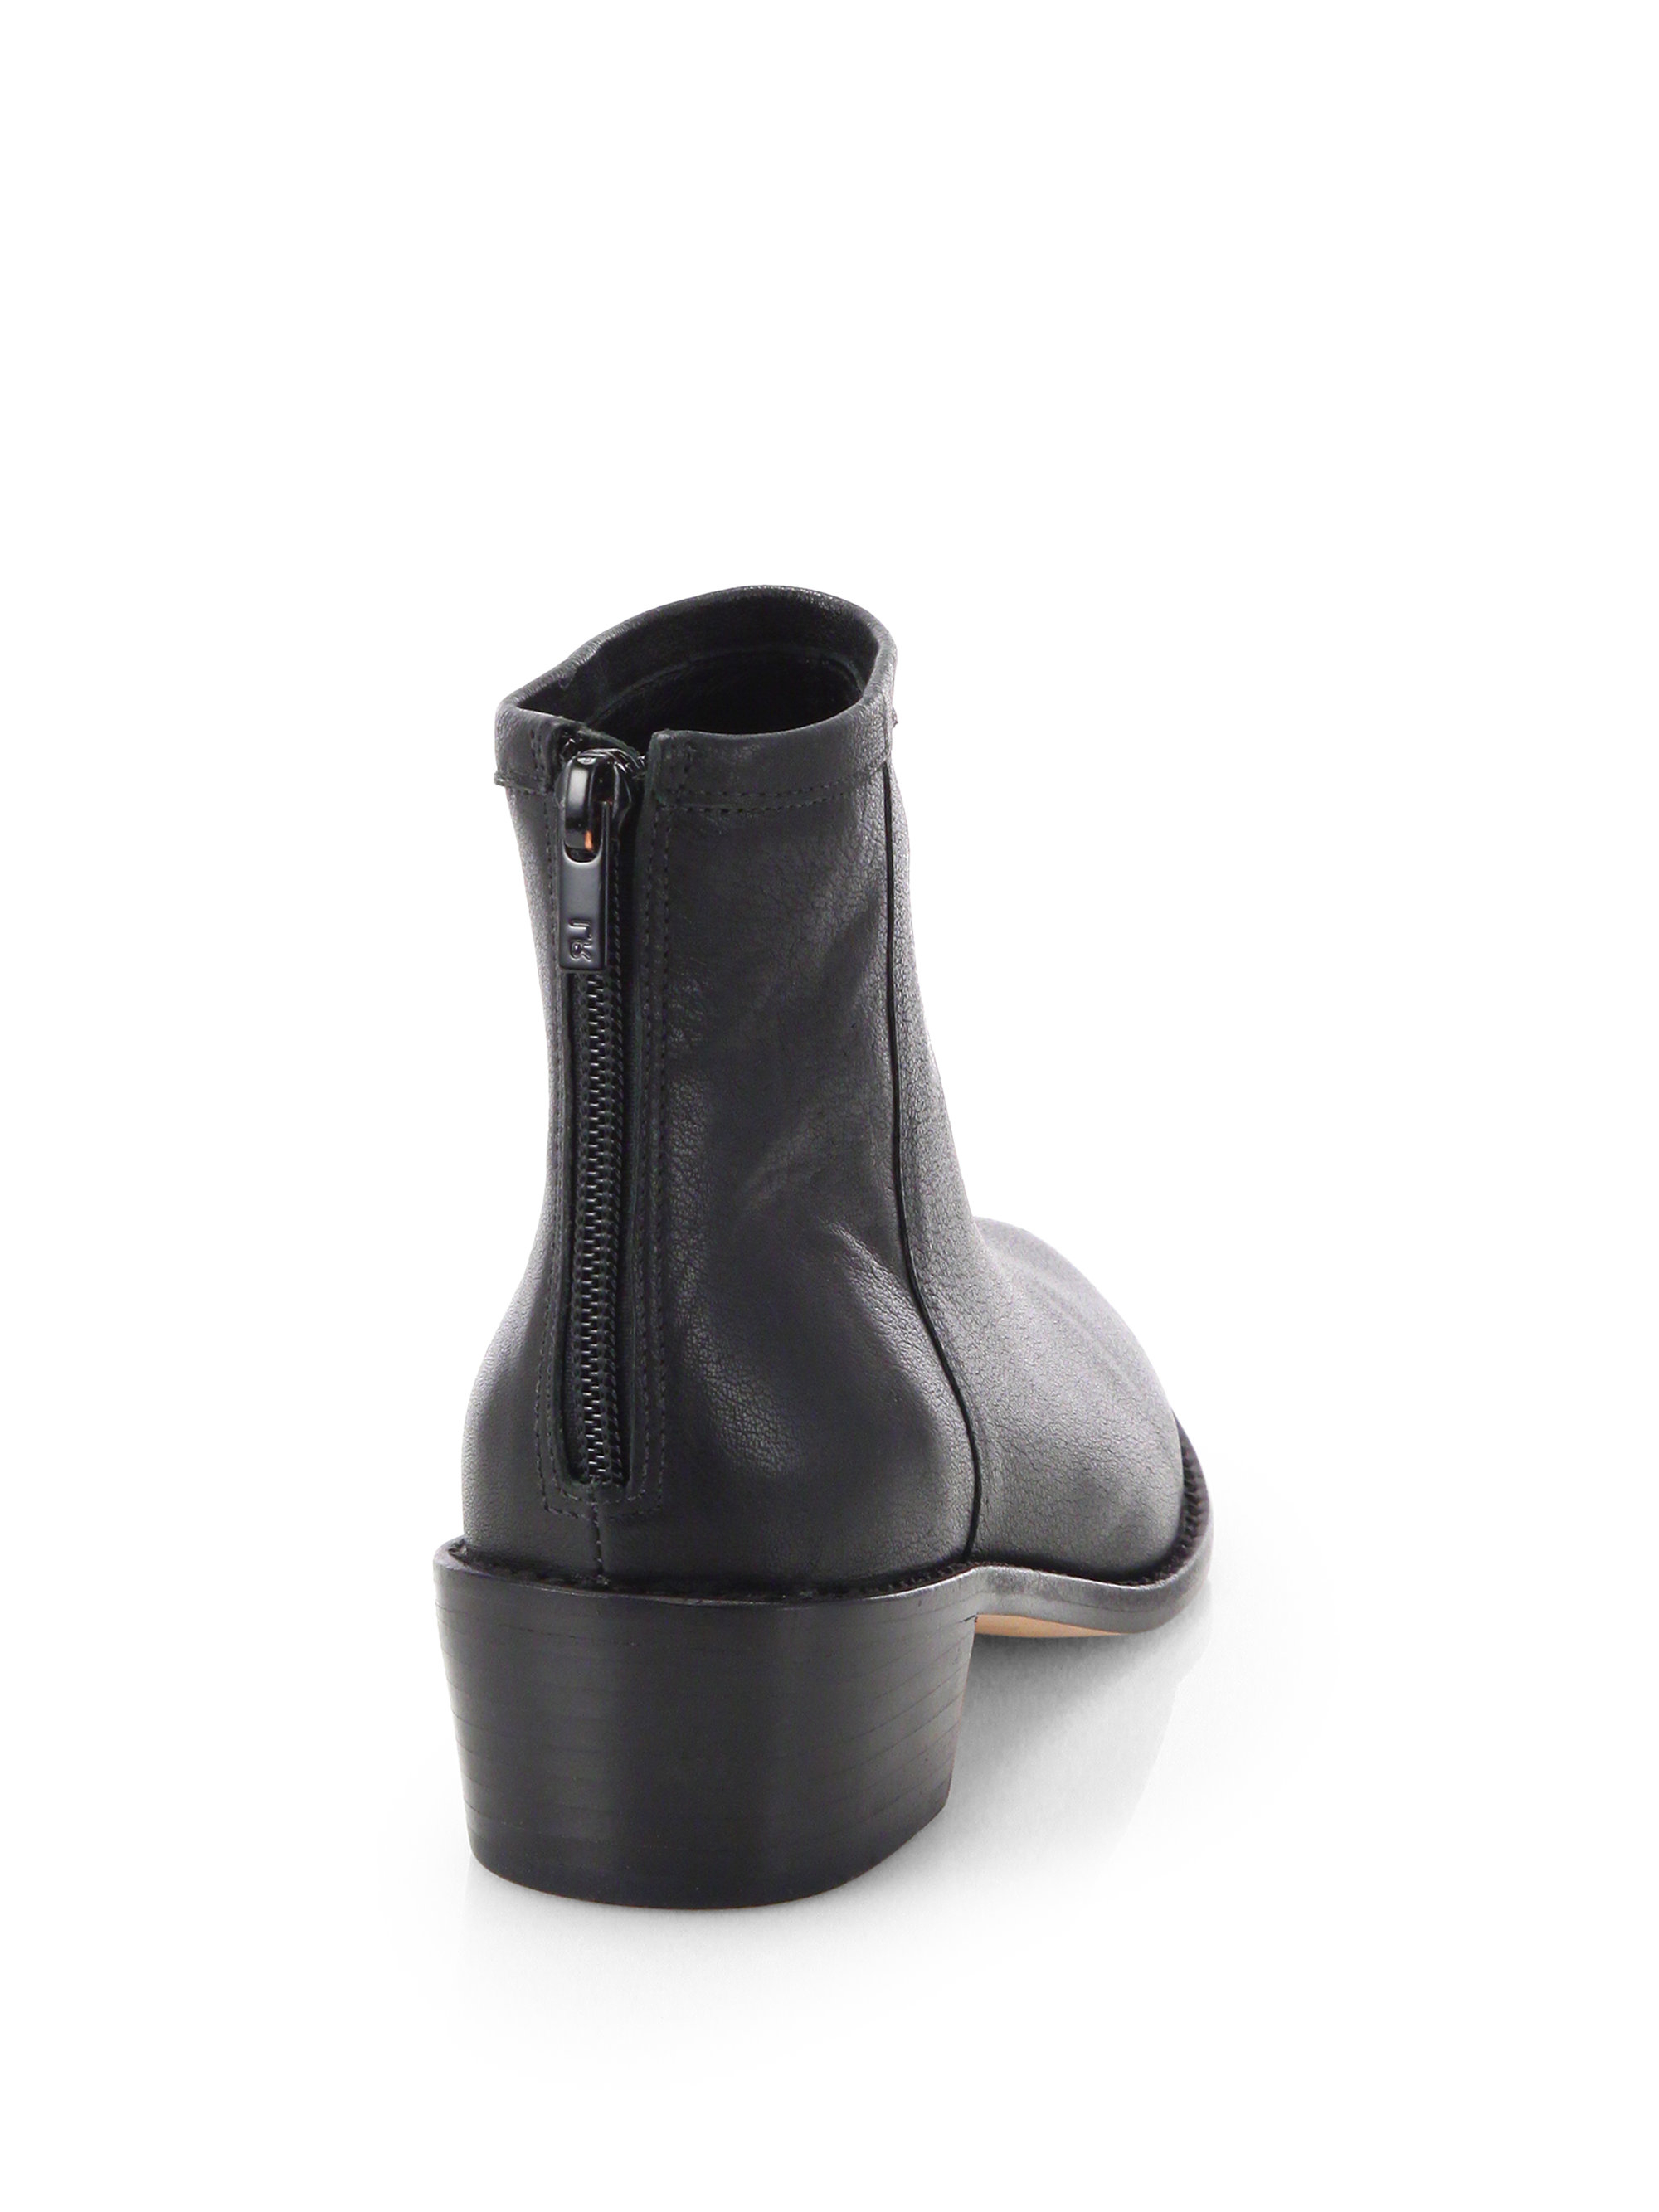 3023106d043 Loeffler Randall Black Felix Leather Ankle Boots